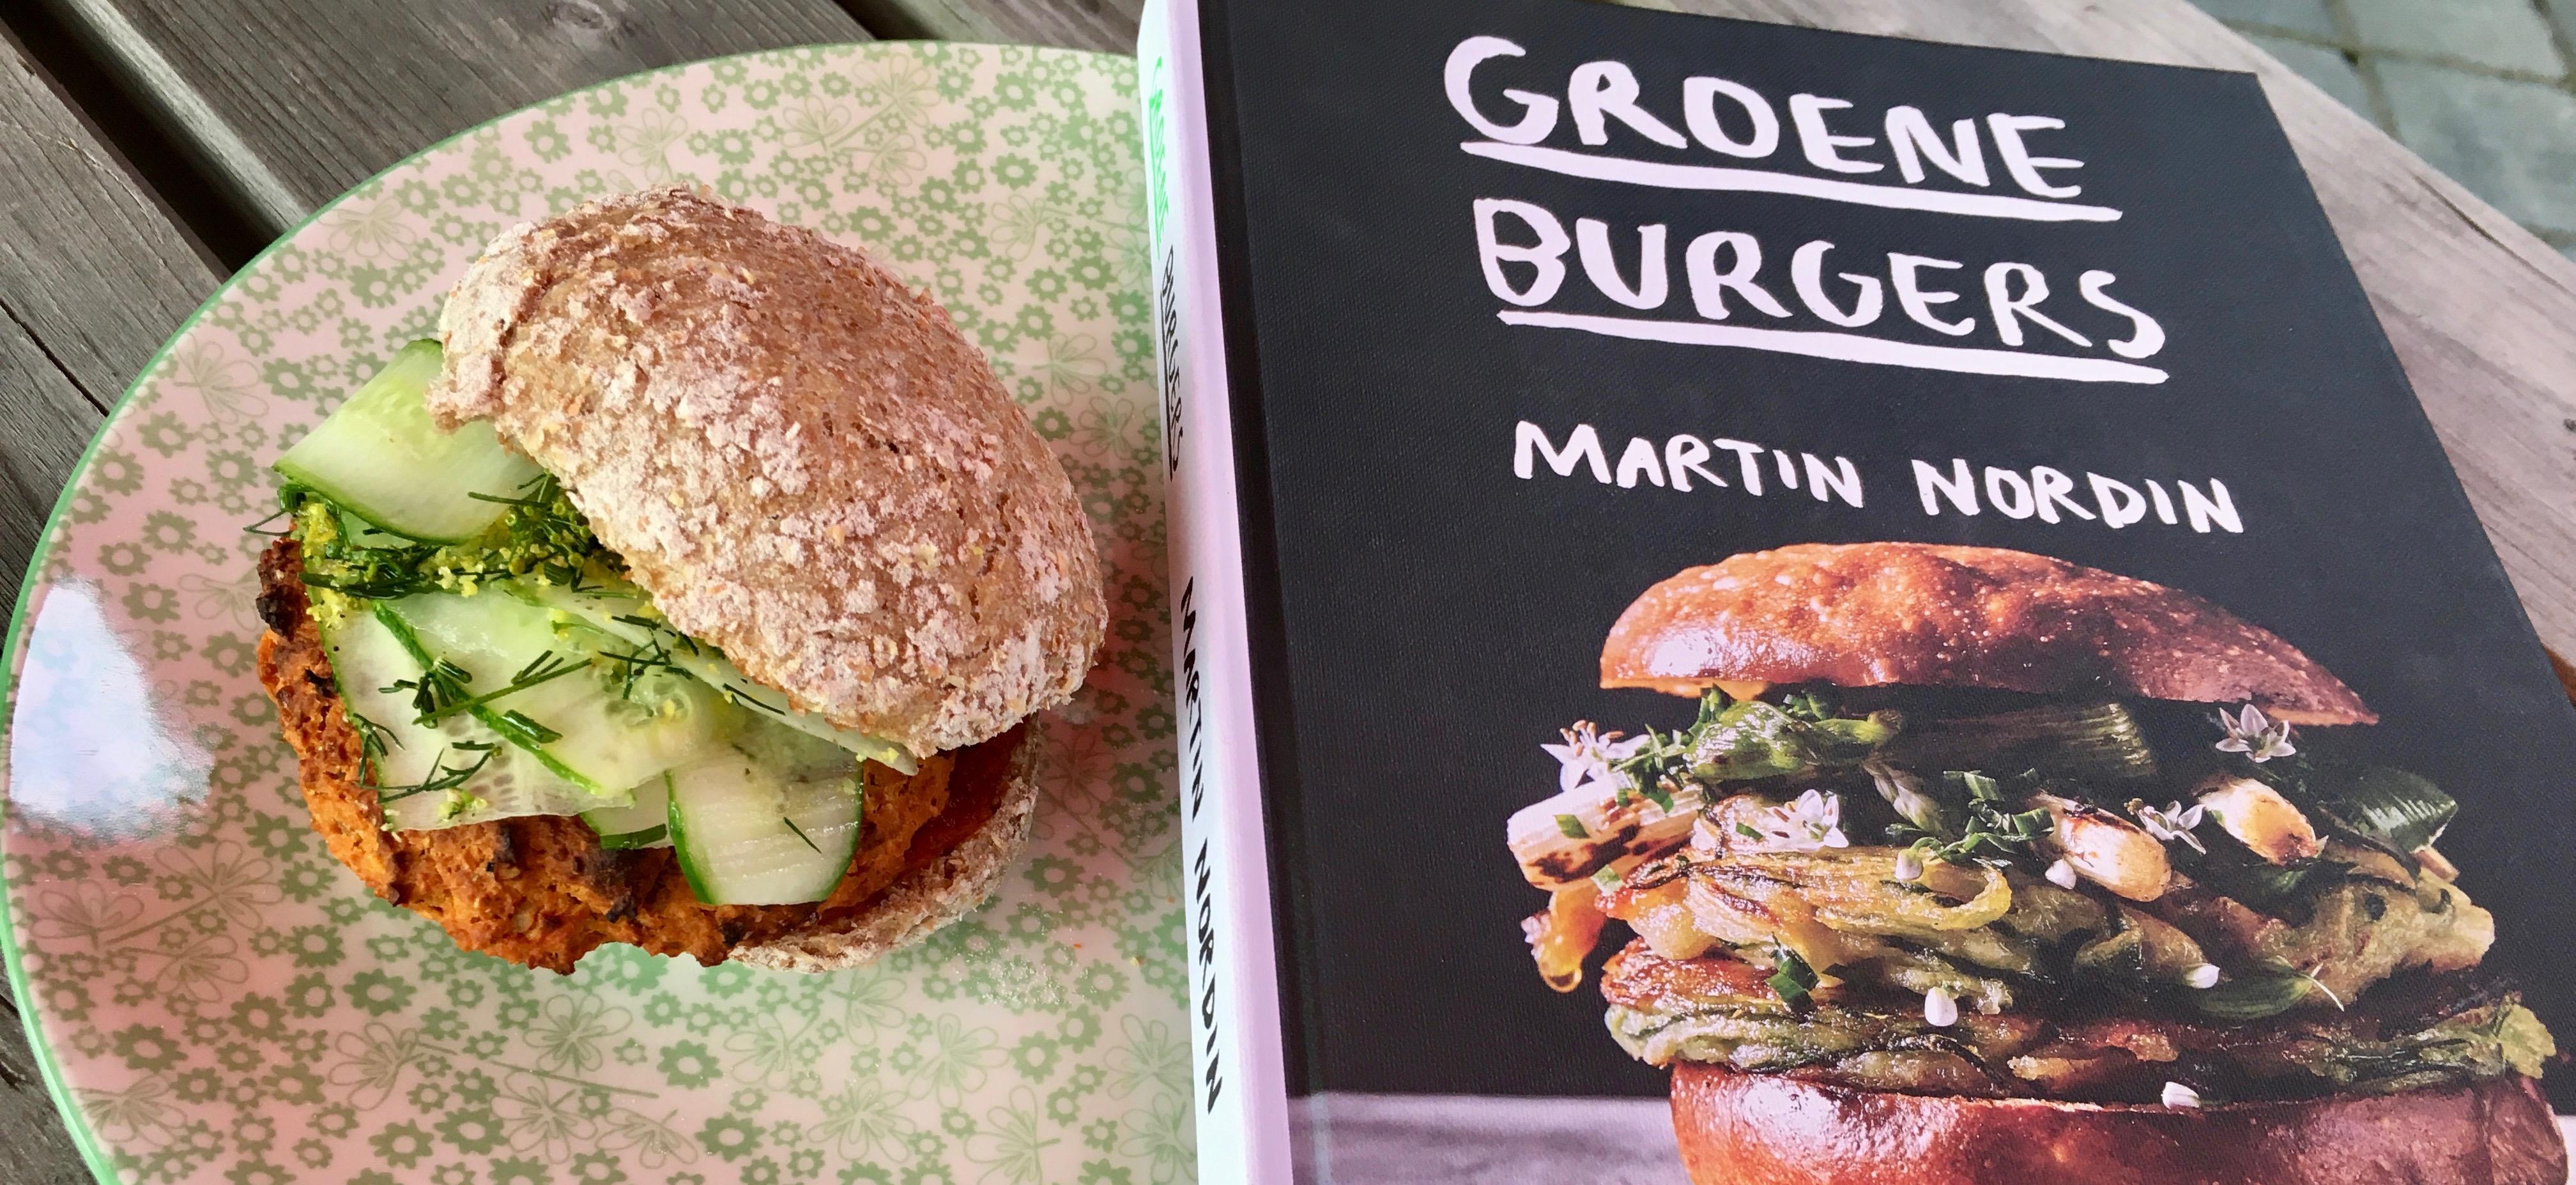 Review: Groene burgers van Martin Nordin